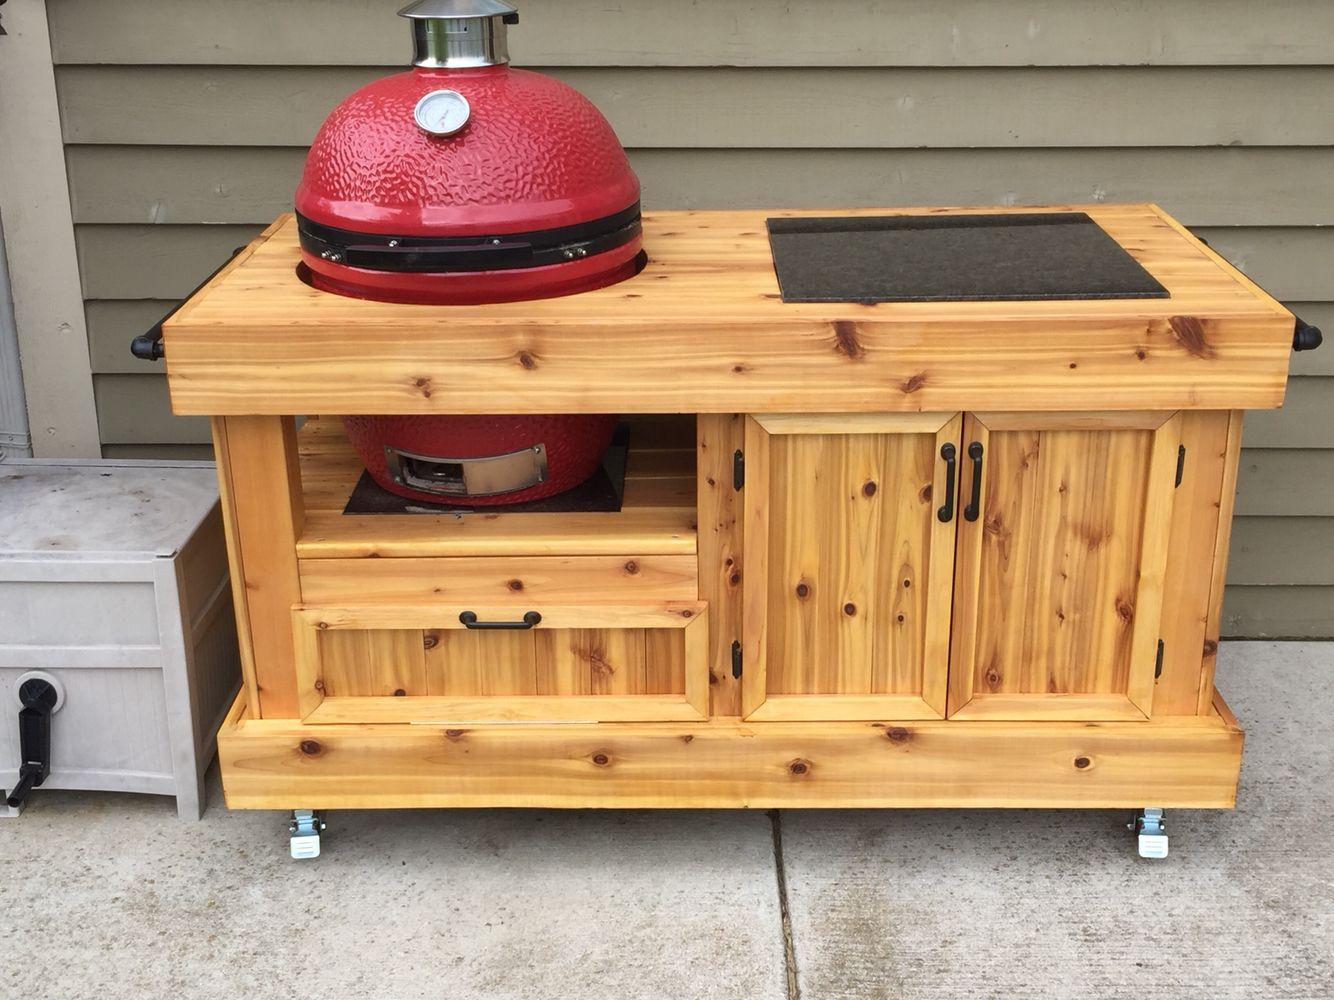 Grill Cart For Komado Joe Built From 100 Cedar Bbq Table Kamado Grill Table Kamado Joe Table Plans